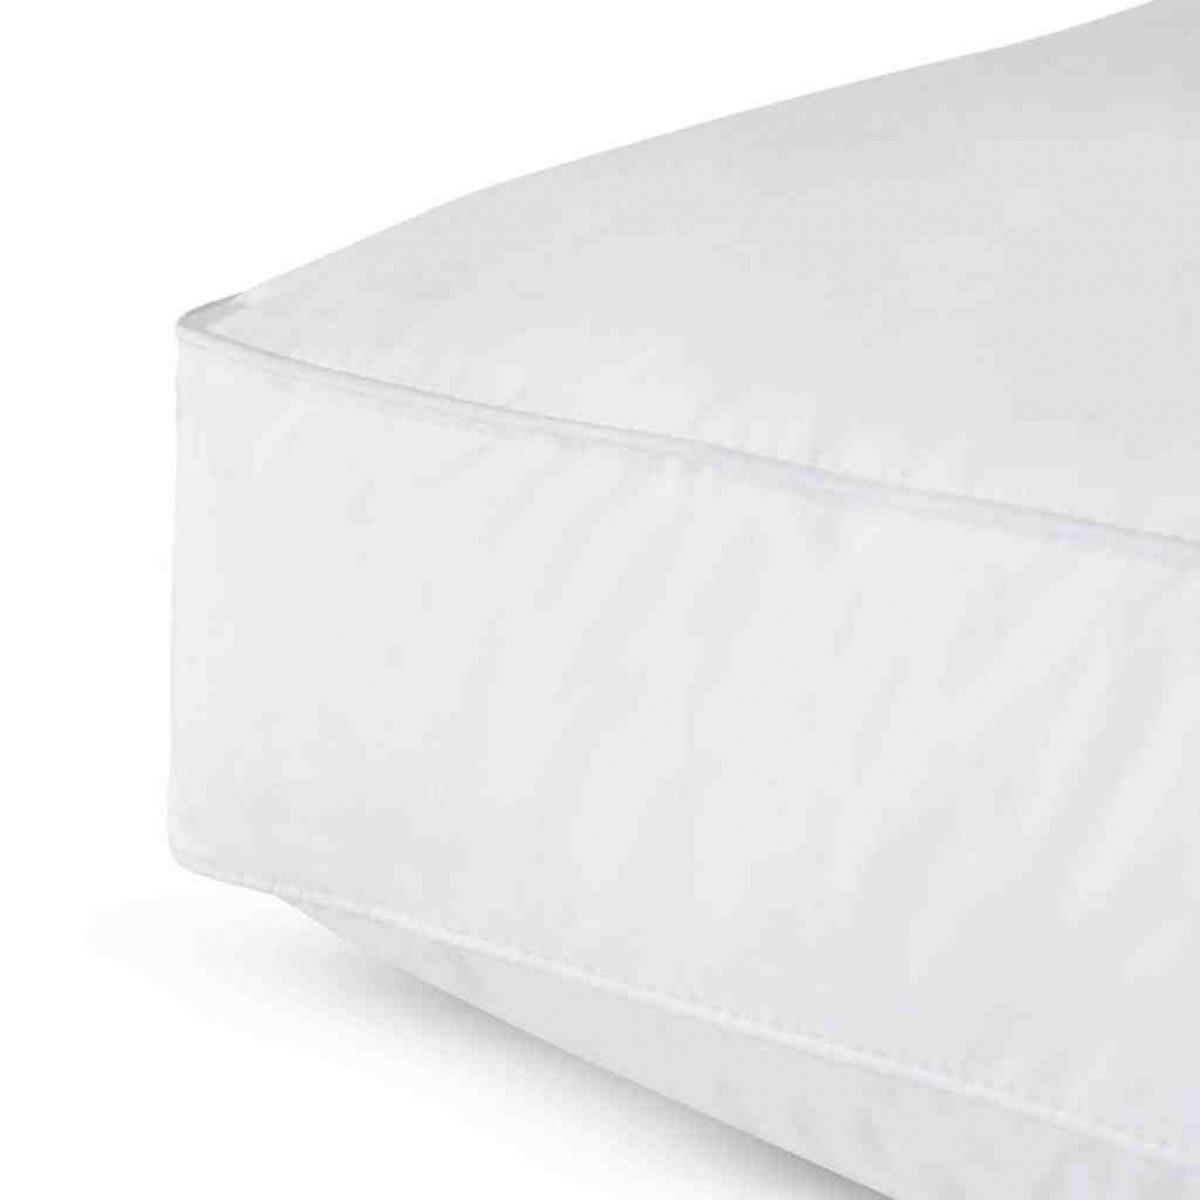 Nimbus Emporium Pearl Smartdown Pillow Detail 1024x1024